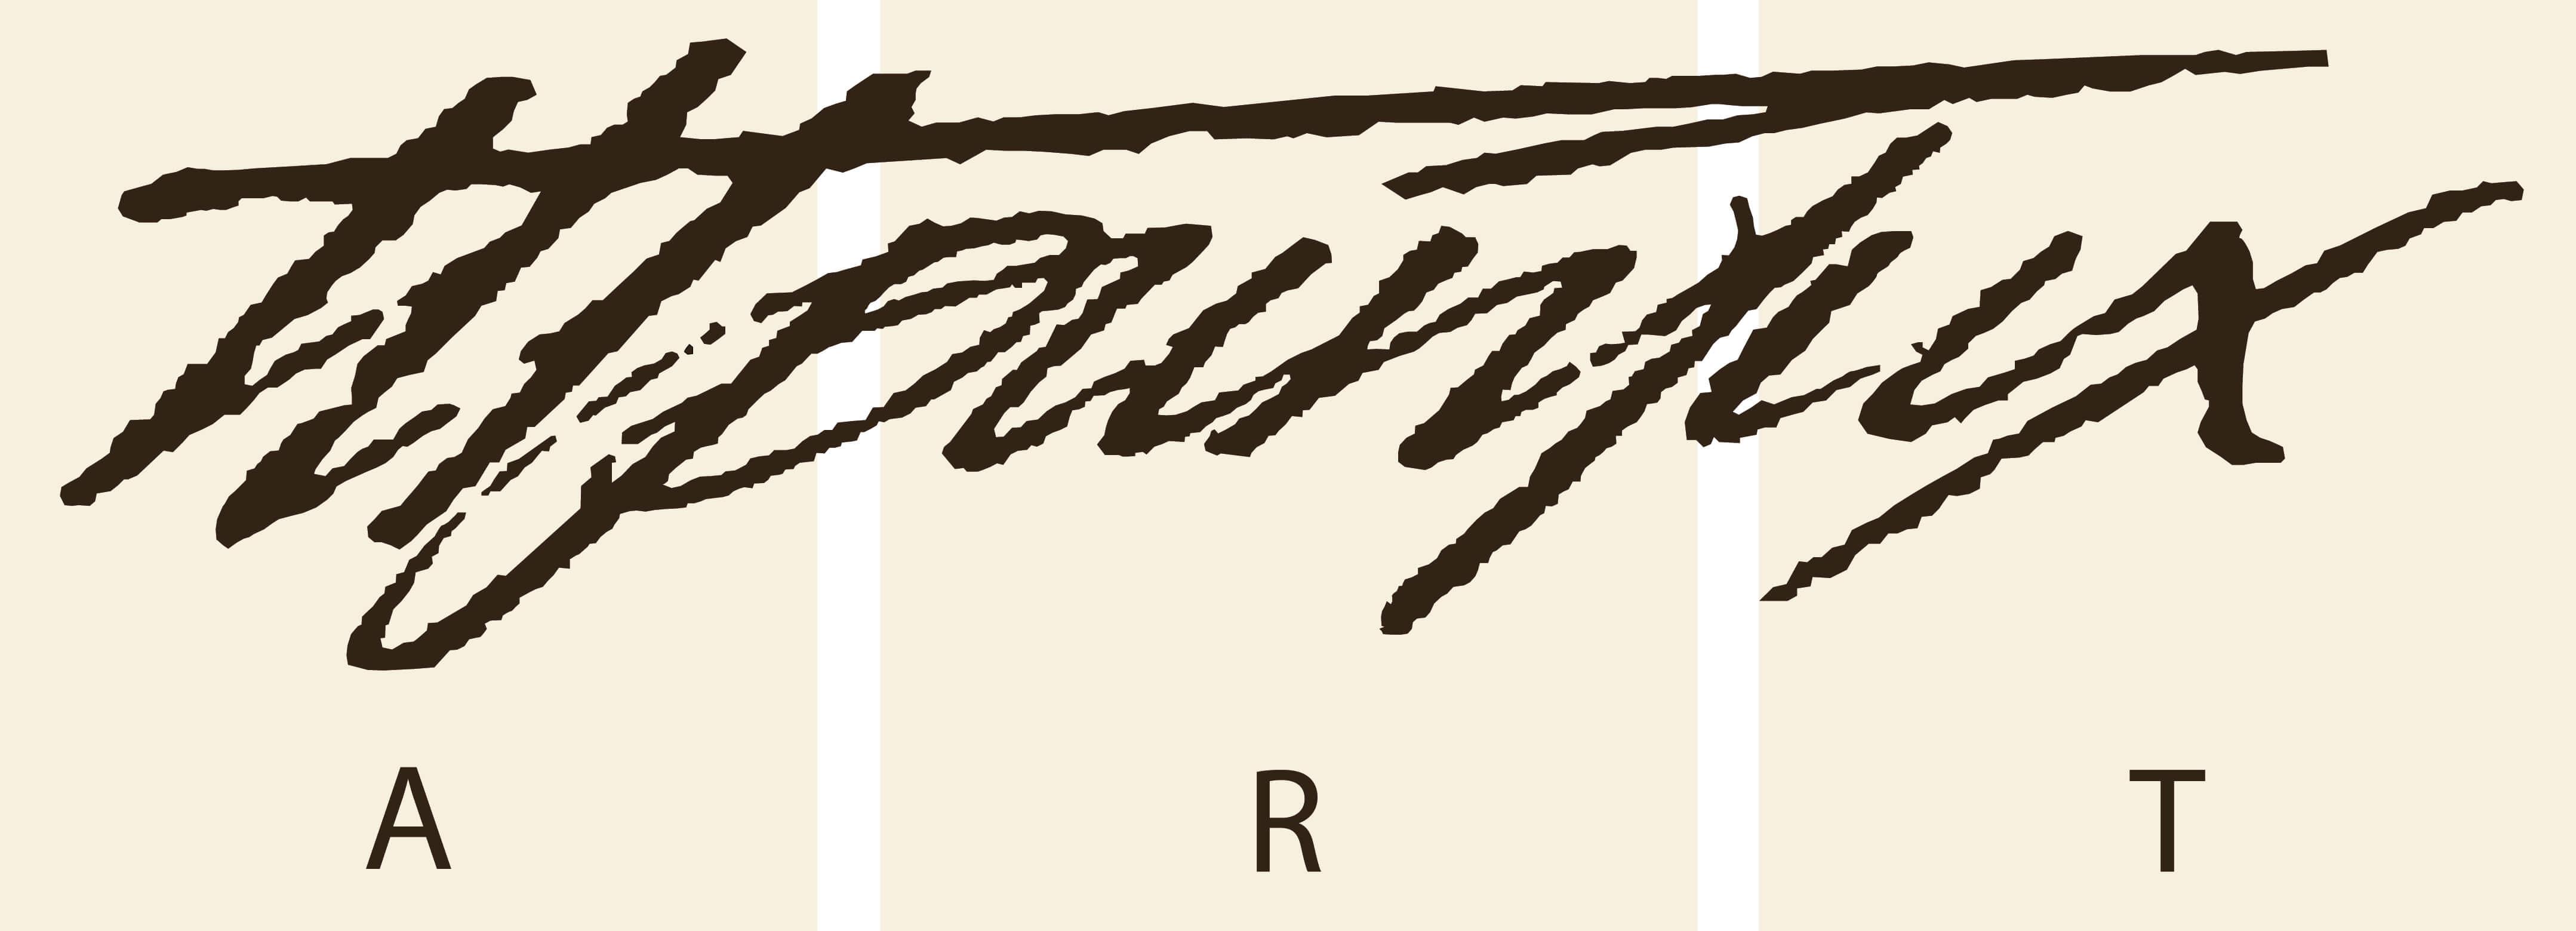 galereya-triptih-art-logo